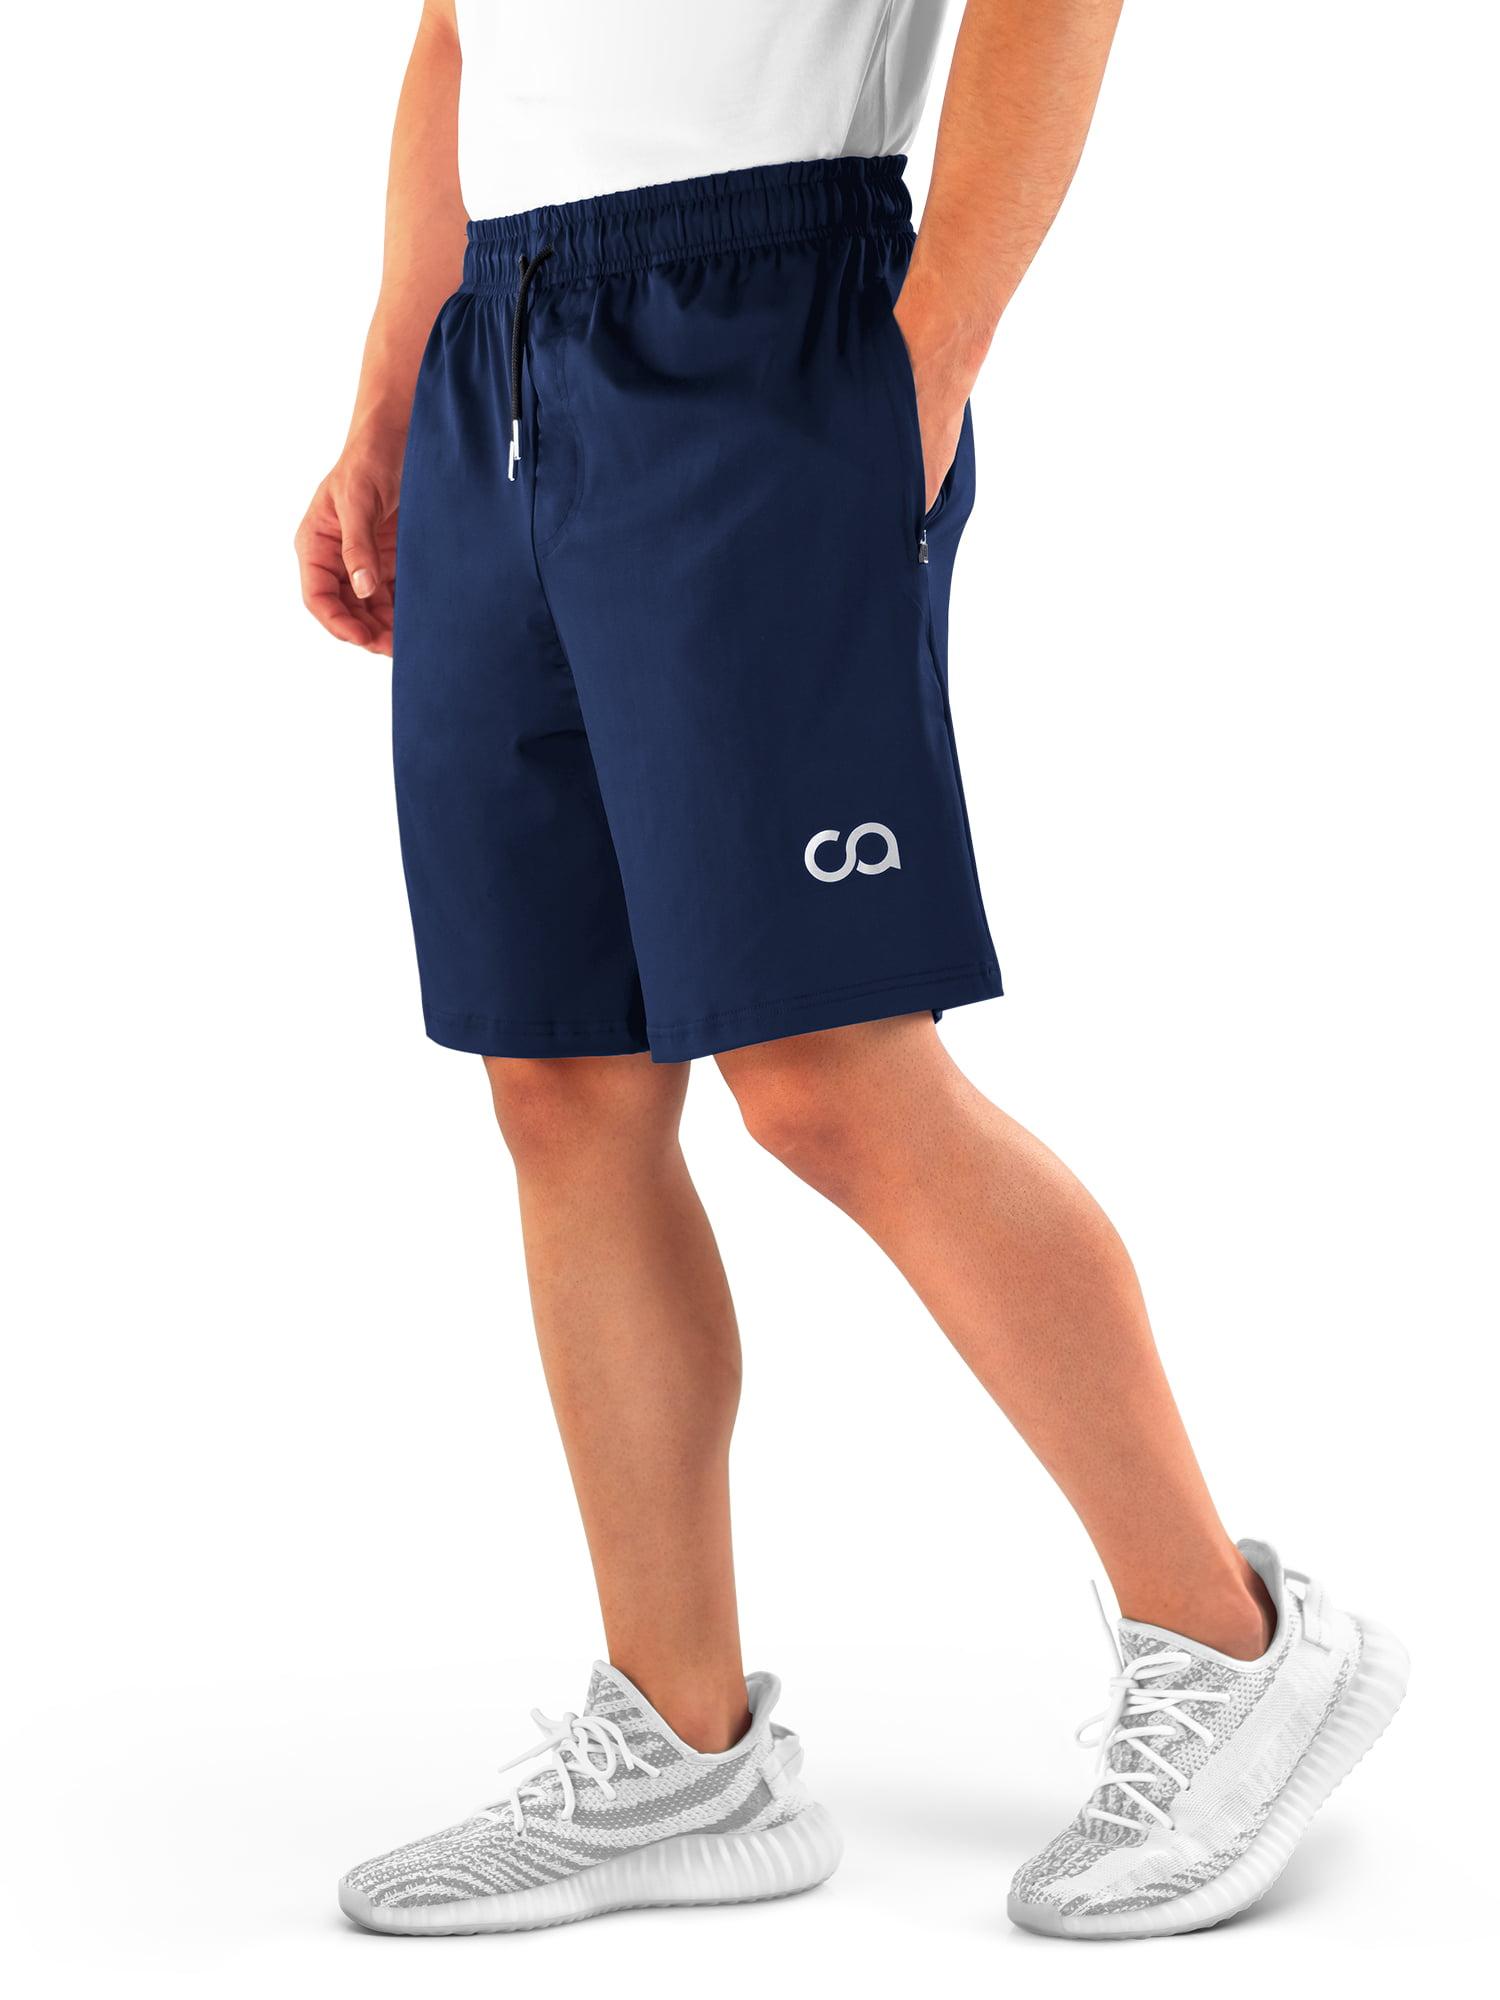 Womens Clothing, Active, Active Shorts, Womens Active